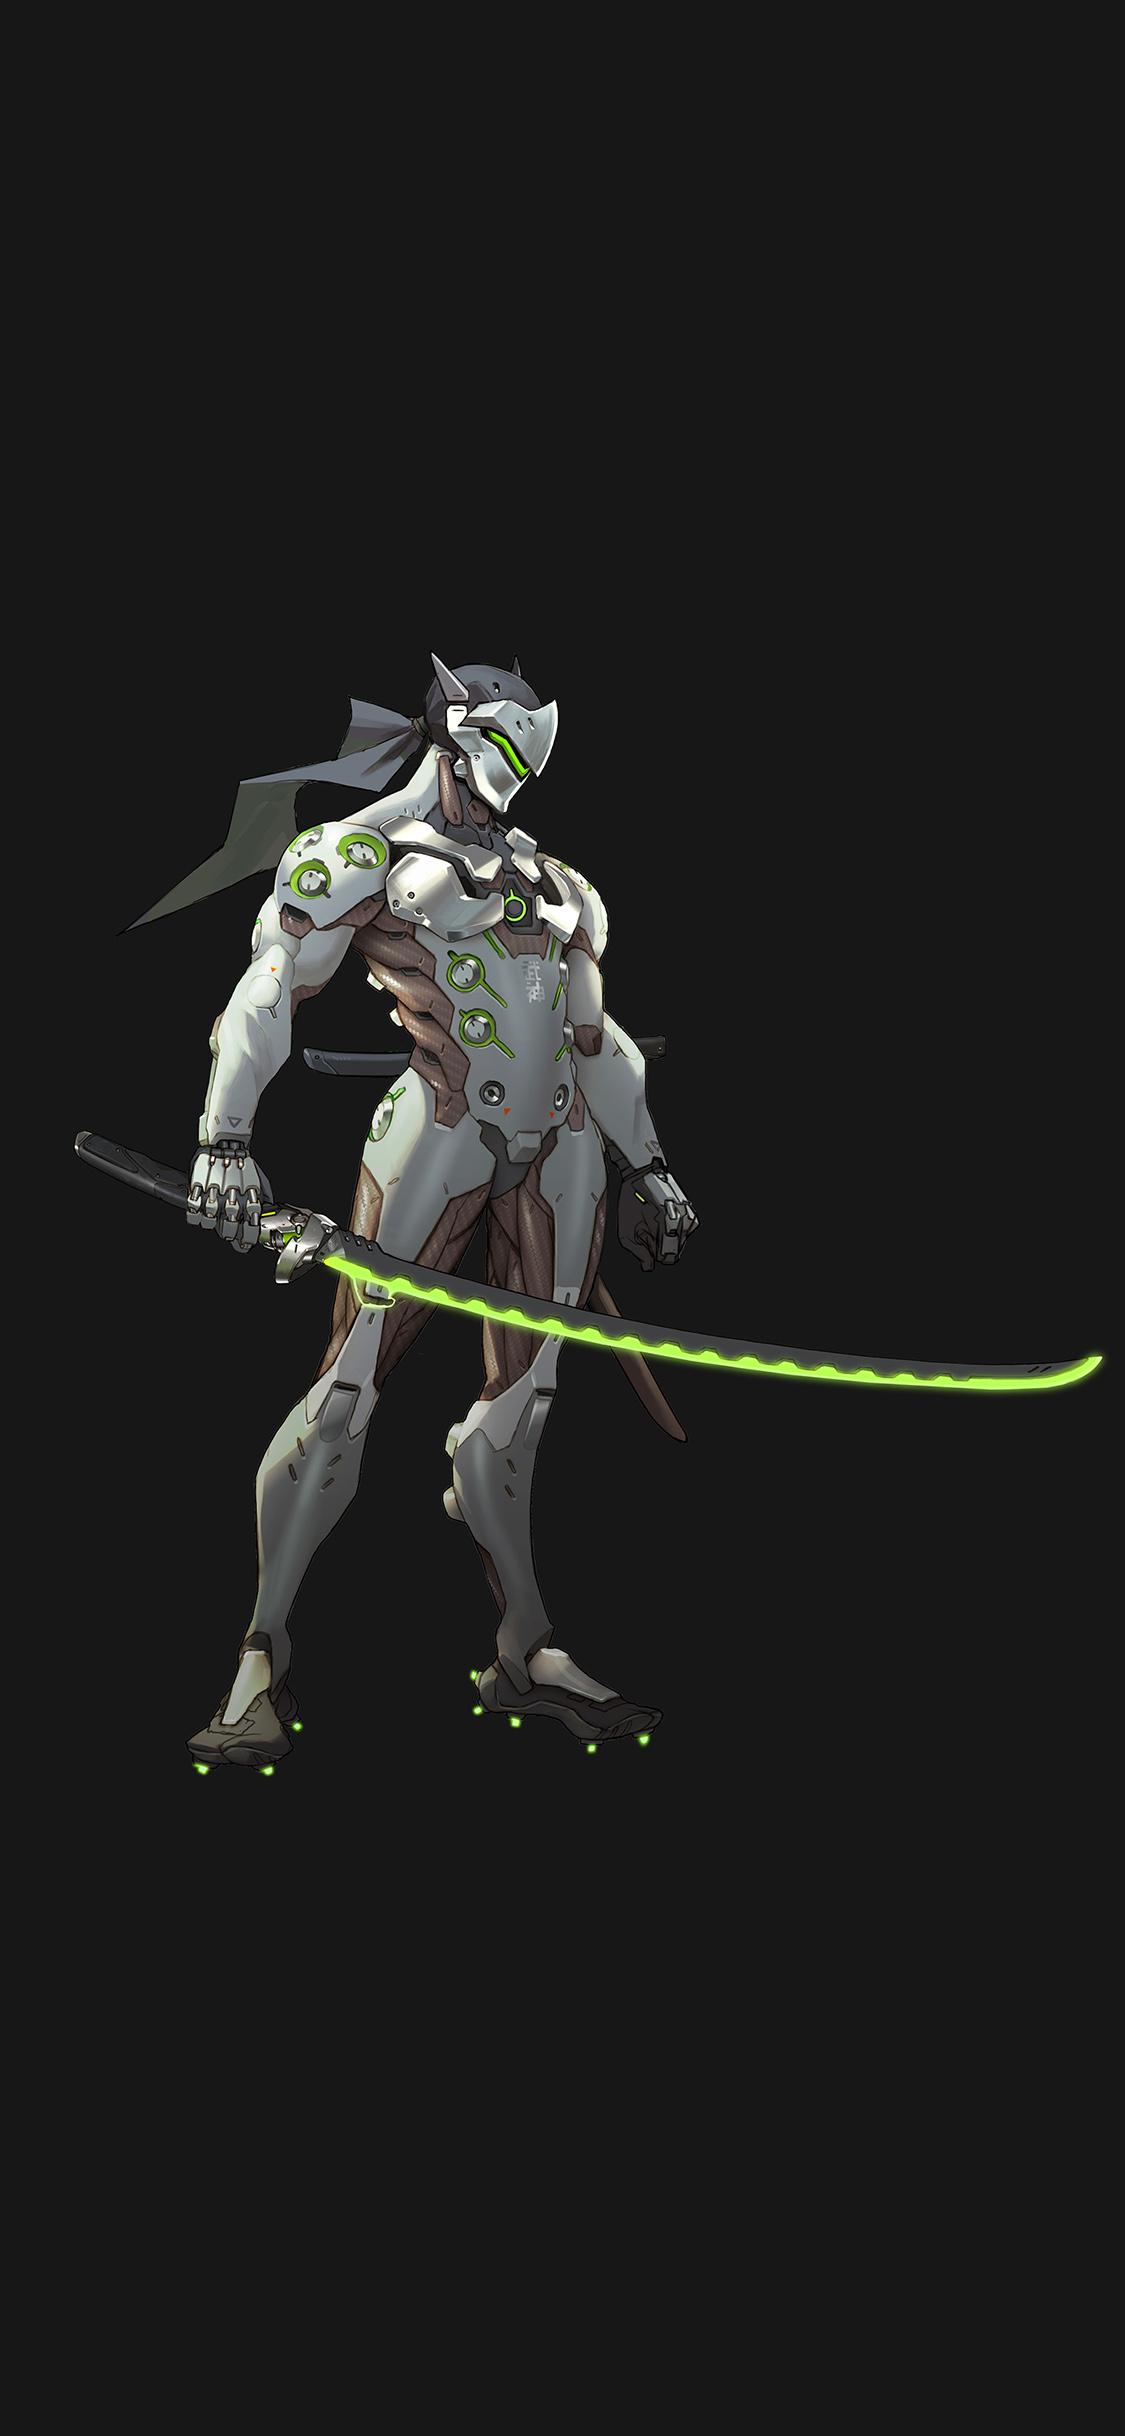 As31 Overwatch Genji Dark Art Illustration Game Wallpaper